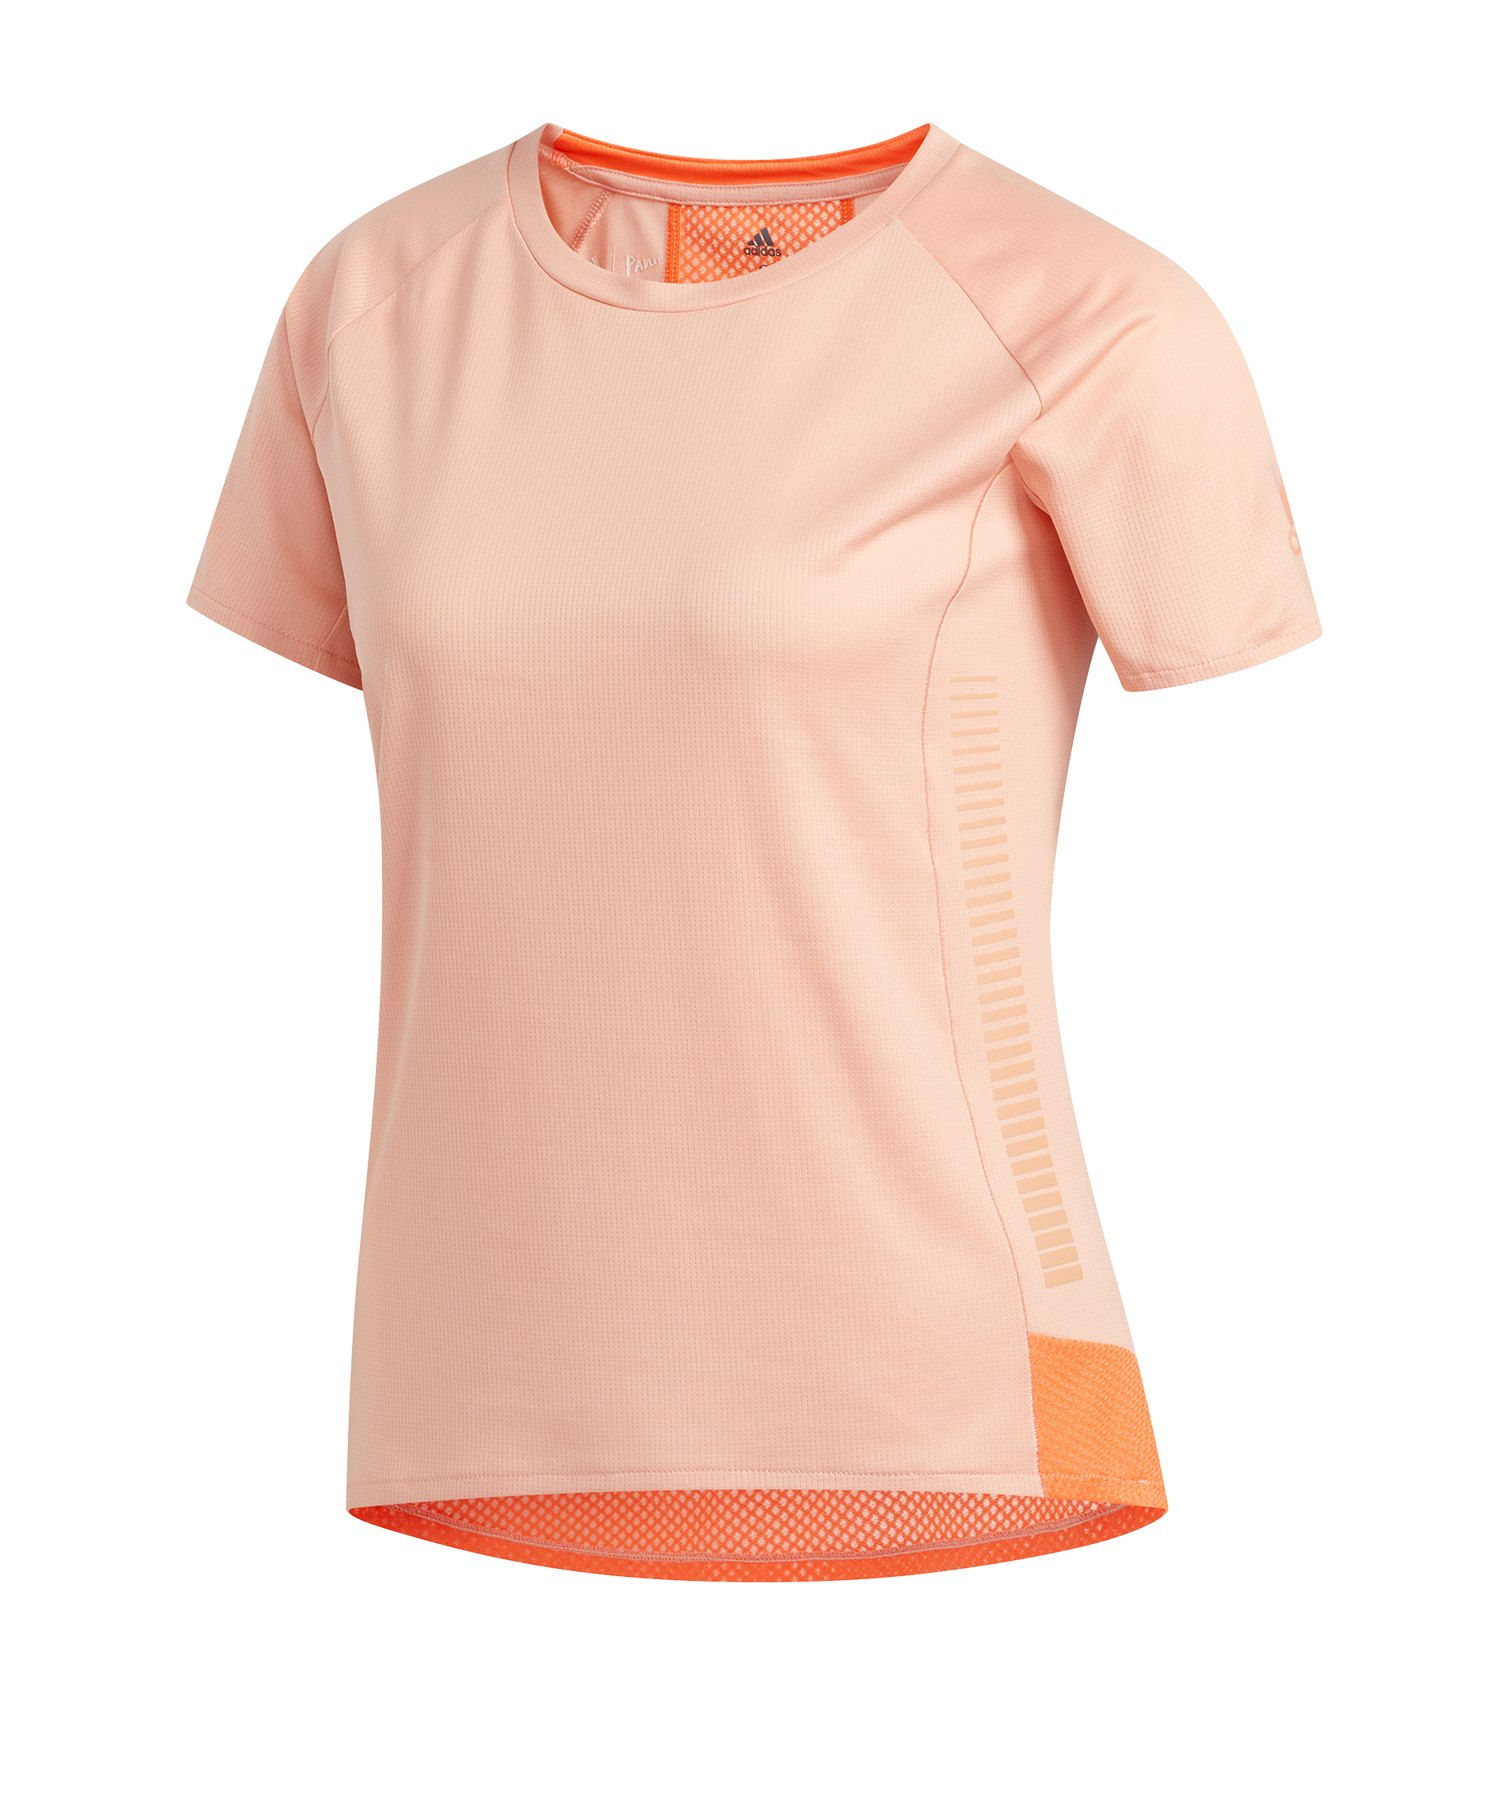 adidas 25/7 Tee T-Shirt Running Rosa - rosa